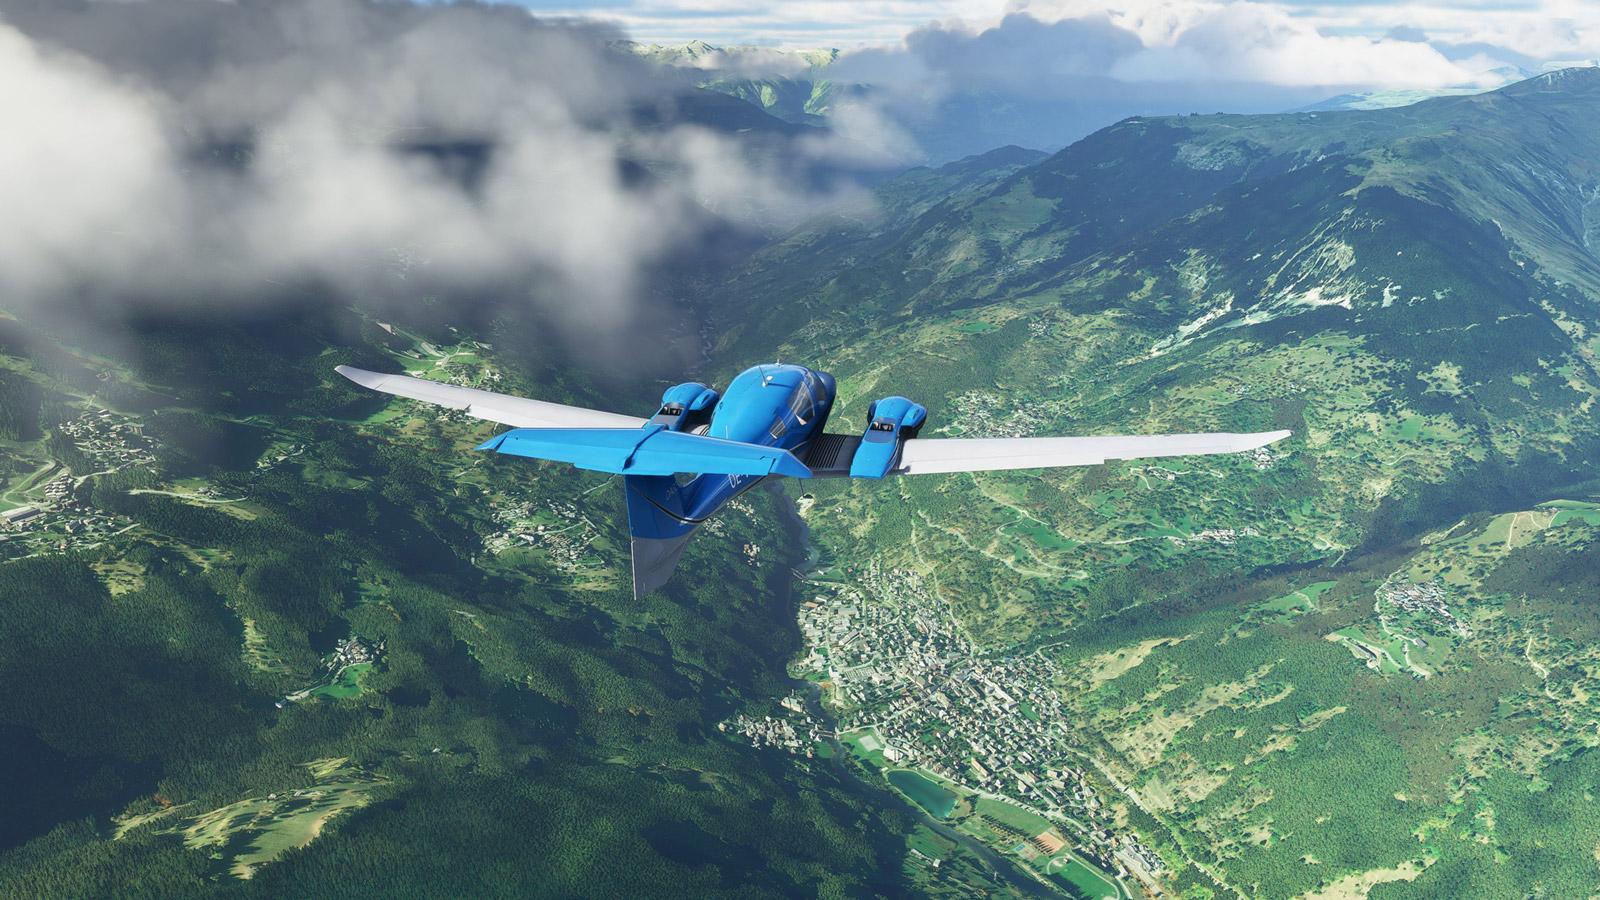 Microsoft Flight Simulator (2020) Wallpaper in 1600x900